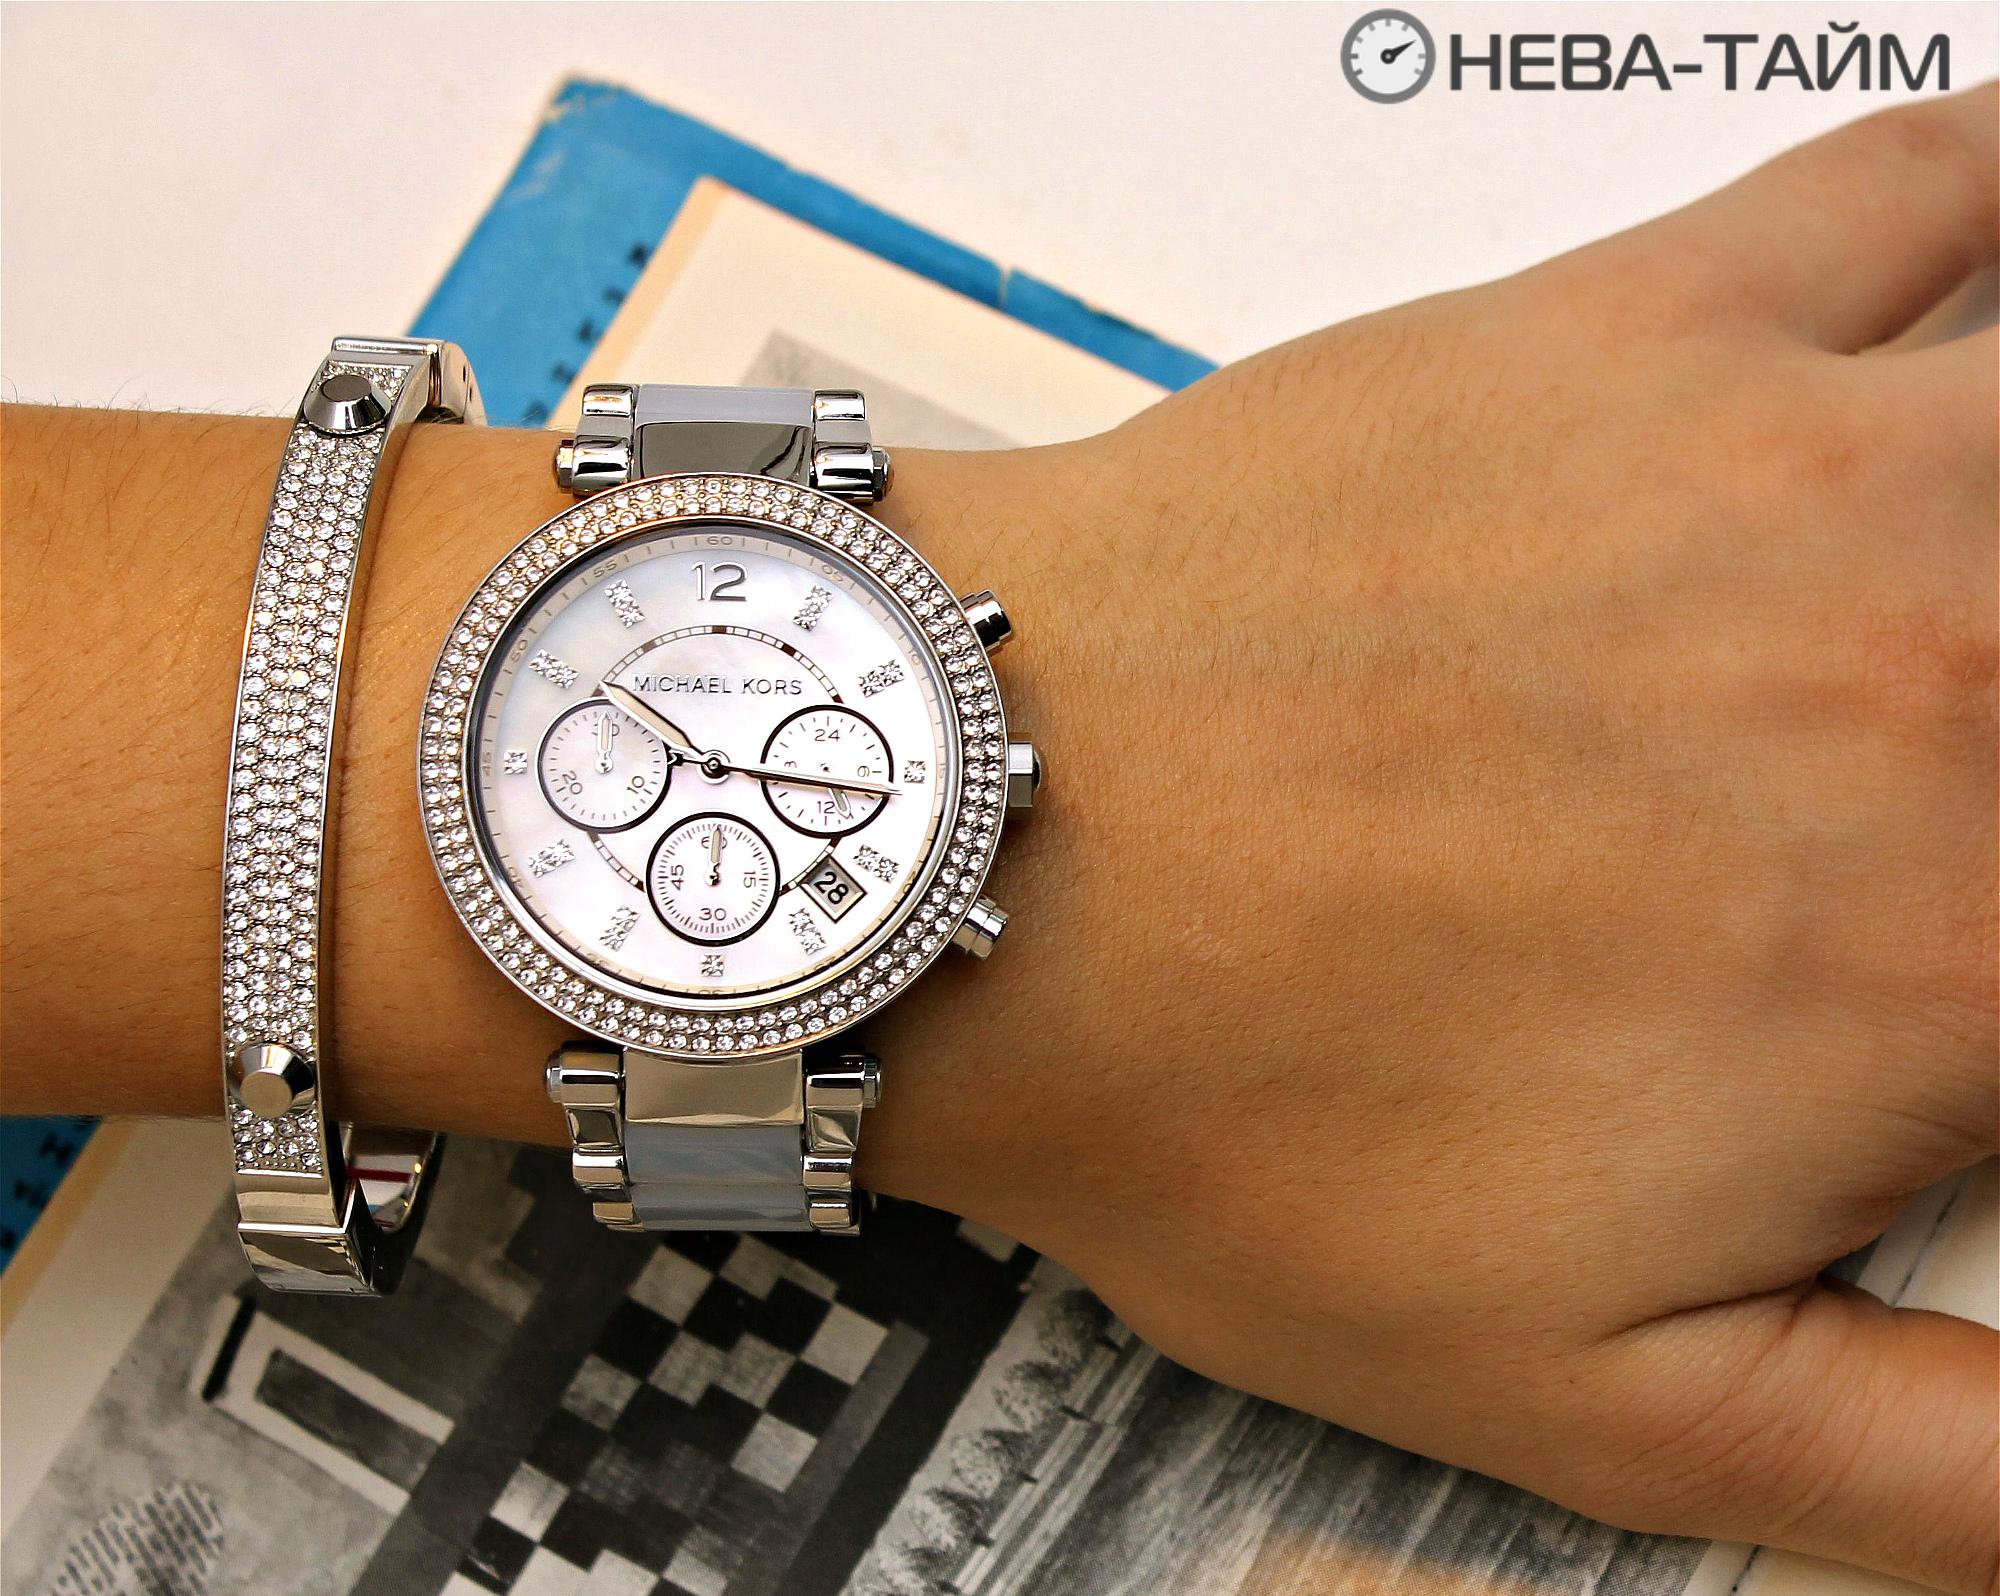 Часы Michael Kors с браслетами - Майкл Корс Оригинал